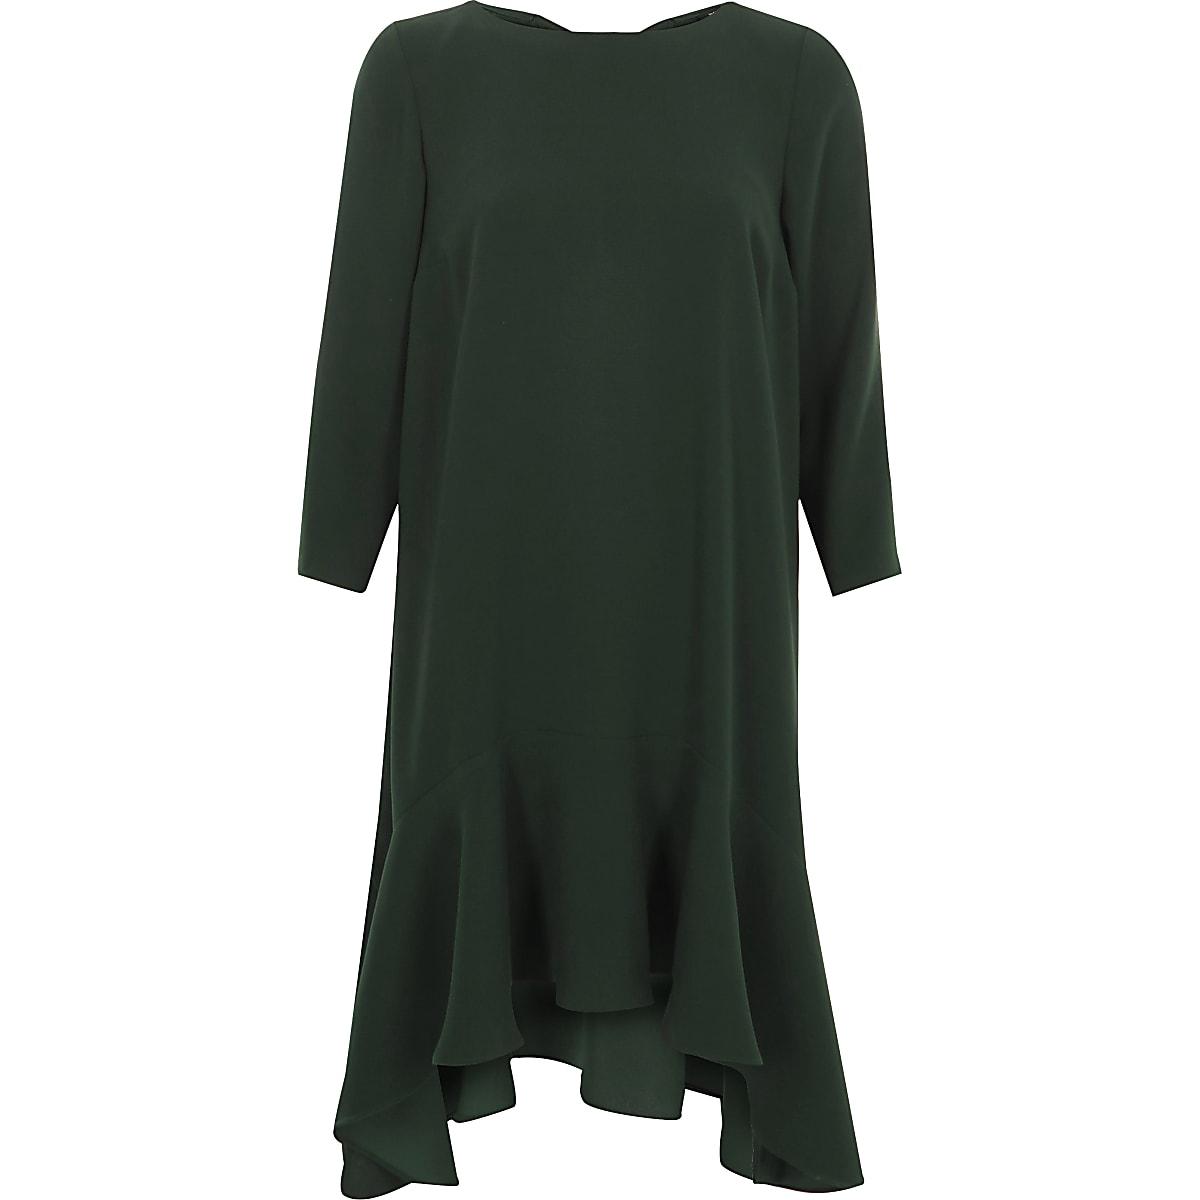 Green frill hem tie back swing dress